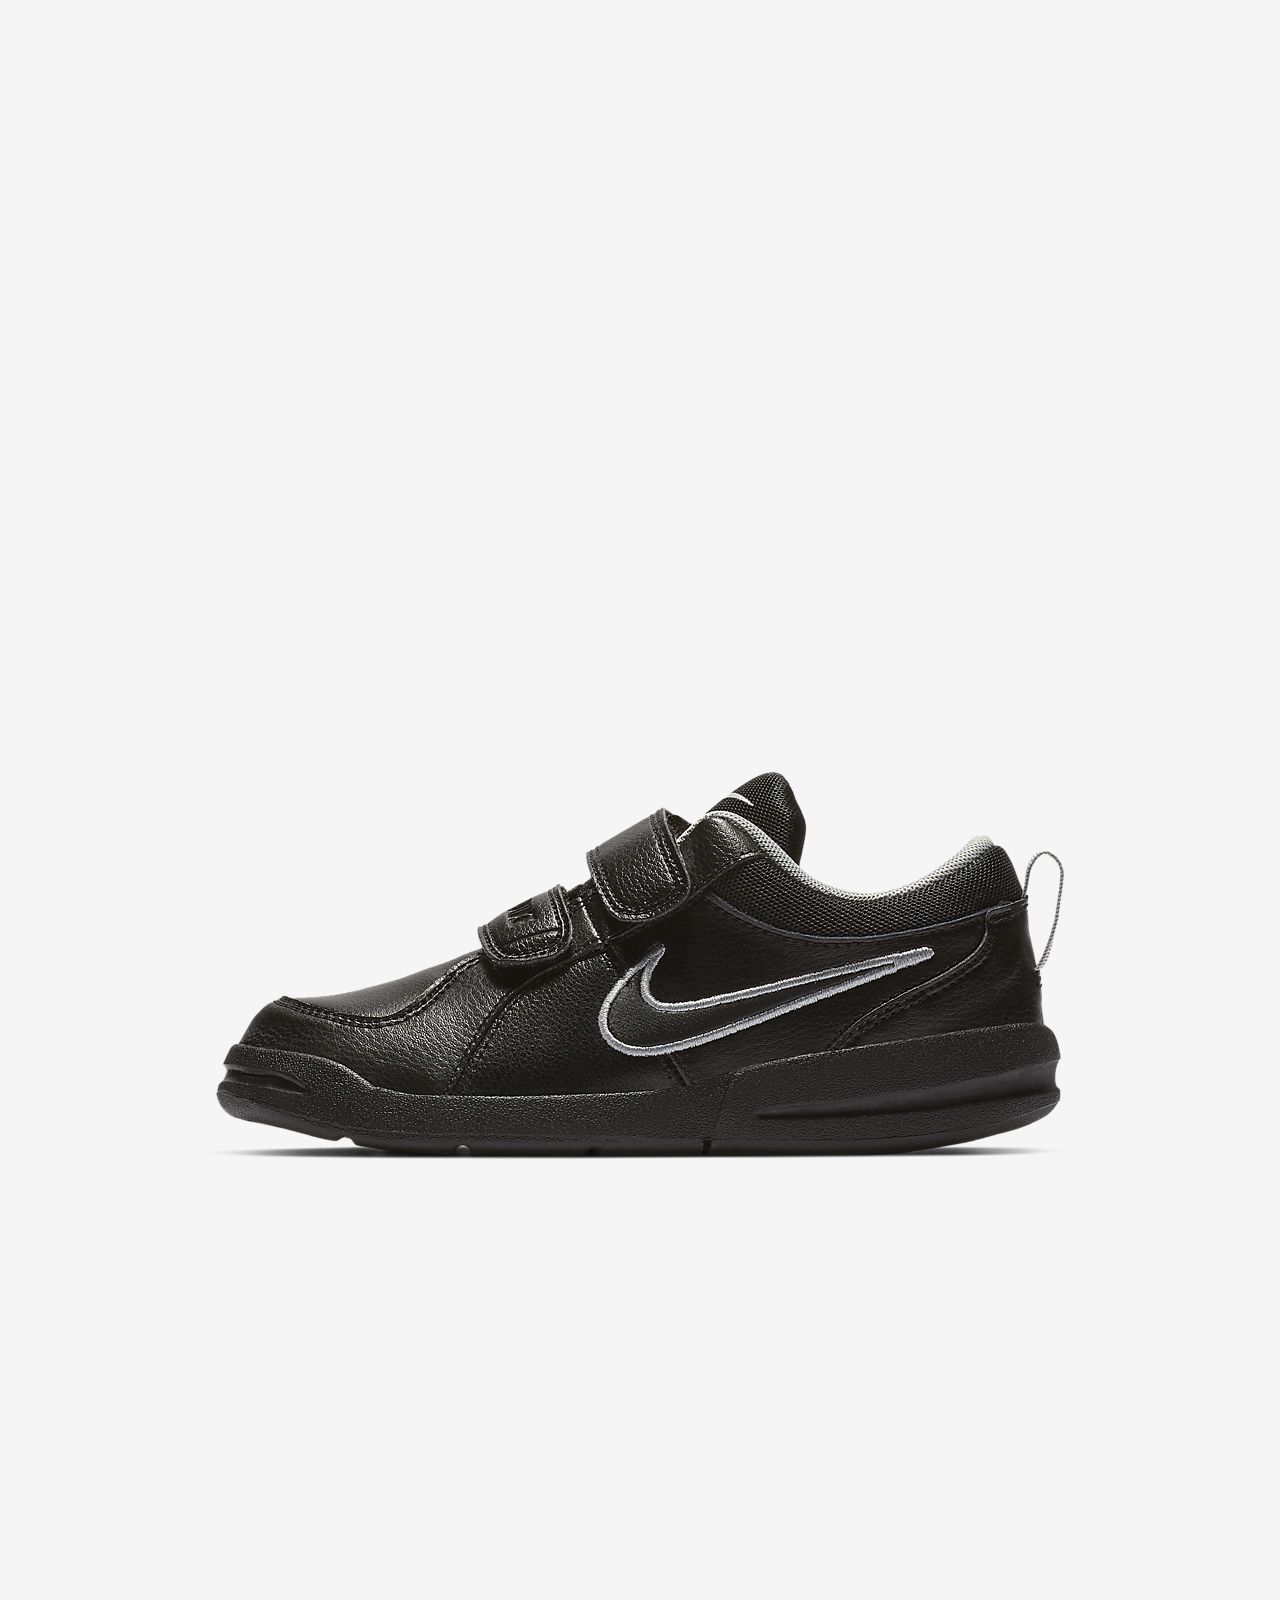 quality design 5097e 42130 ... Scarpa Nike Pico 4 - Bambino